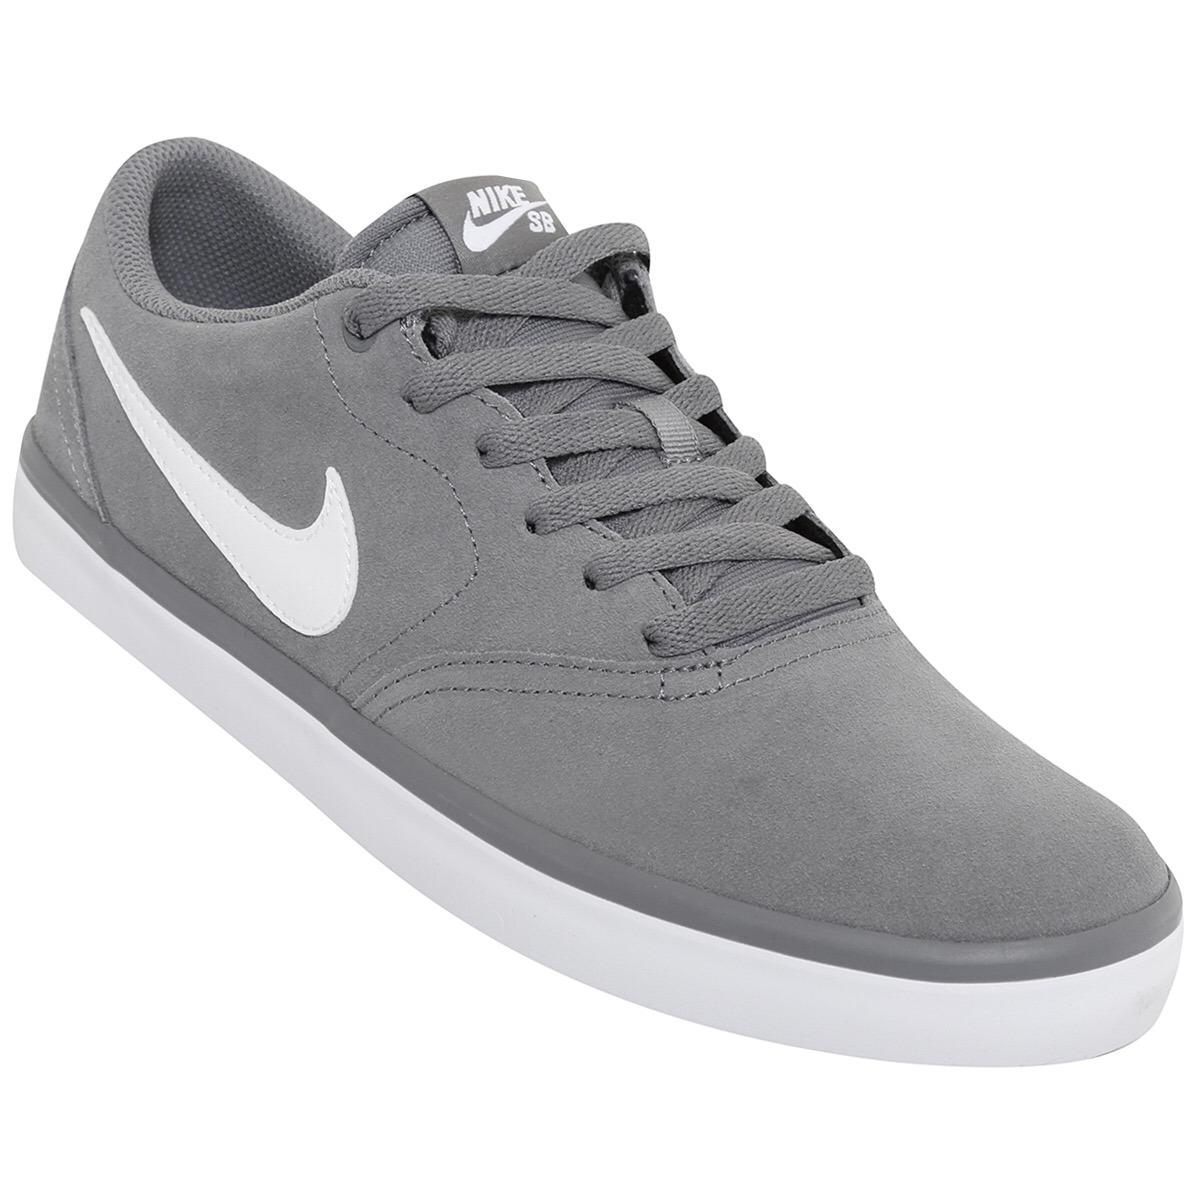 Skateboarding Grises Grises Nike Nike Skateboarding Basket Basket Basket Nike Basket Grises Skateboarding Nike hCdrxtsQ